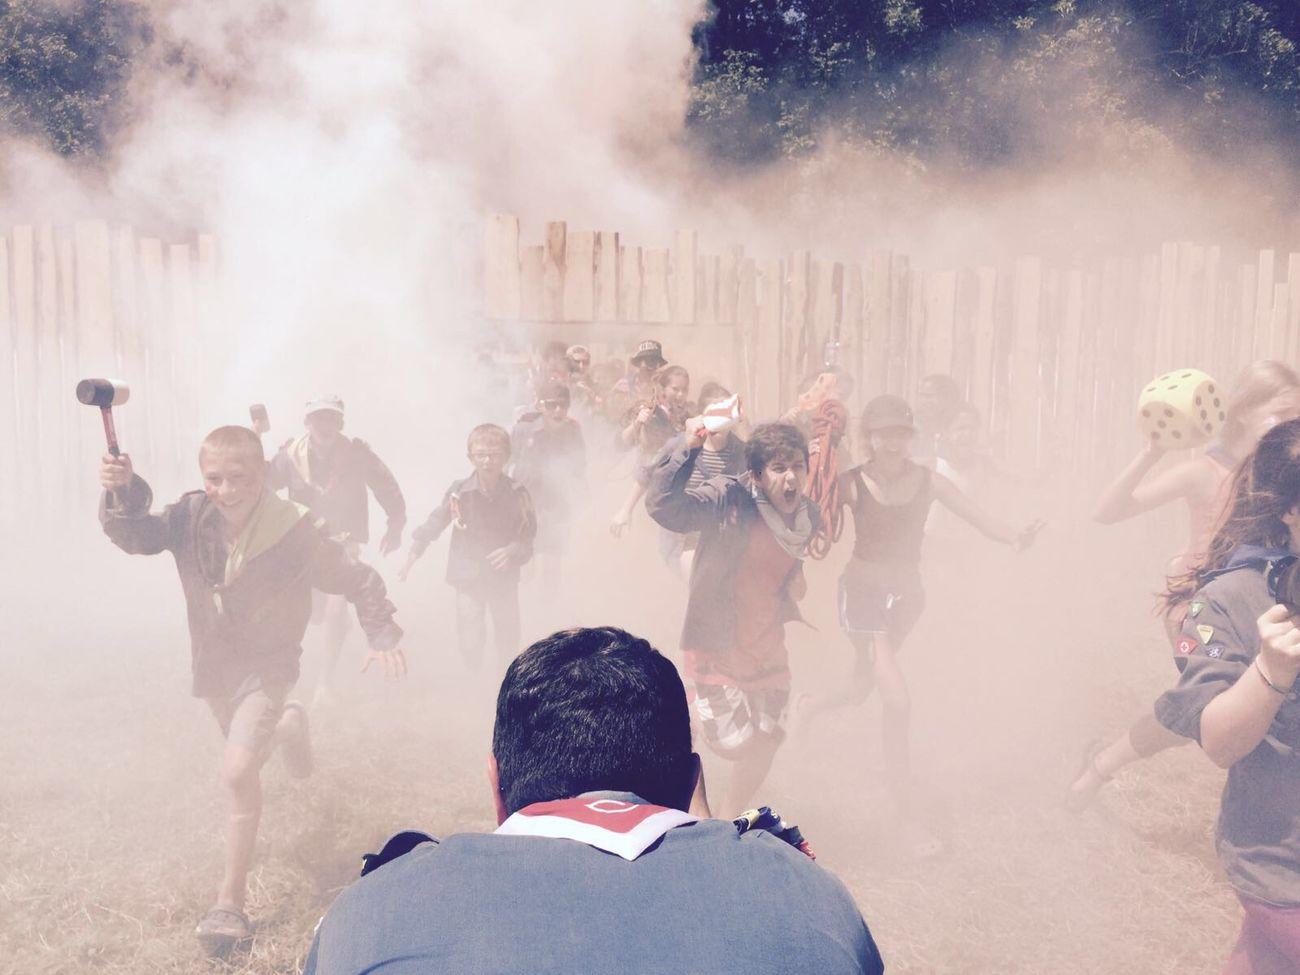 Pathfinder , smoke, outside, stand, still, camera, wild, Pfadfinder, Running People